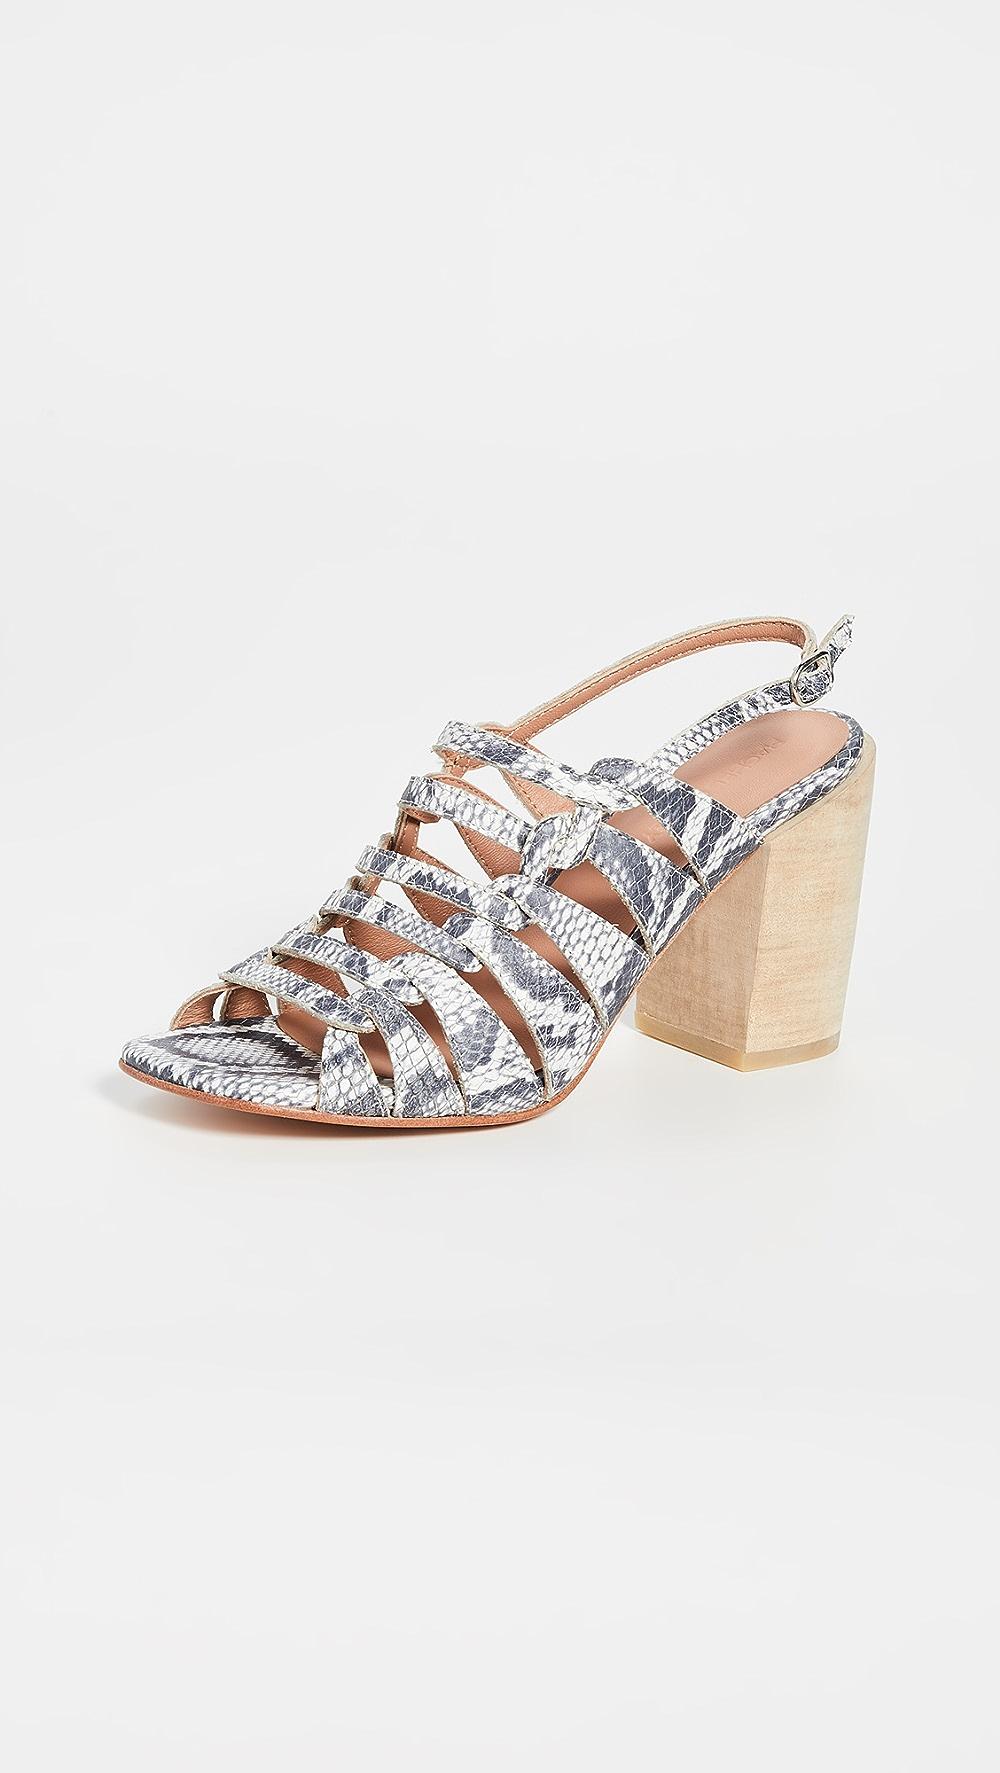 Painstaking Rachel Comey - Geneva Heels The Latest Fashion